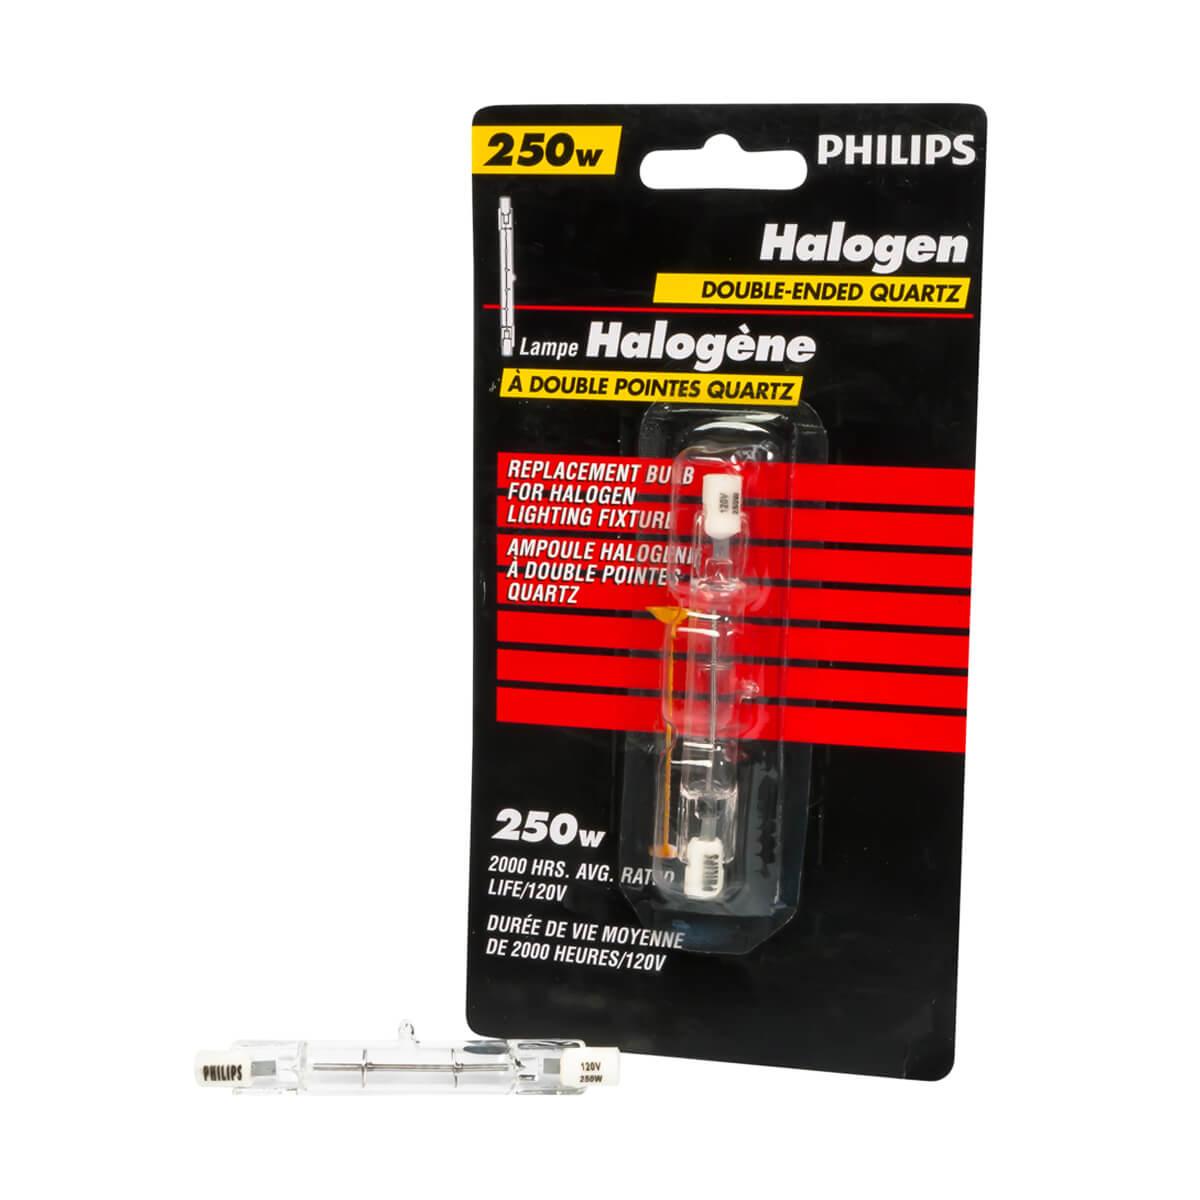 Philips Halogen 250W T3 Quartz 79 mm